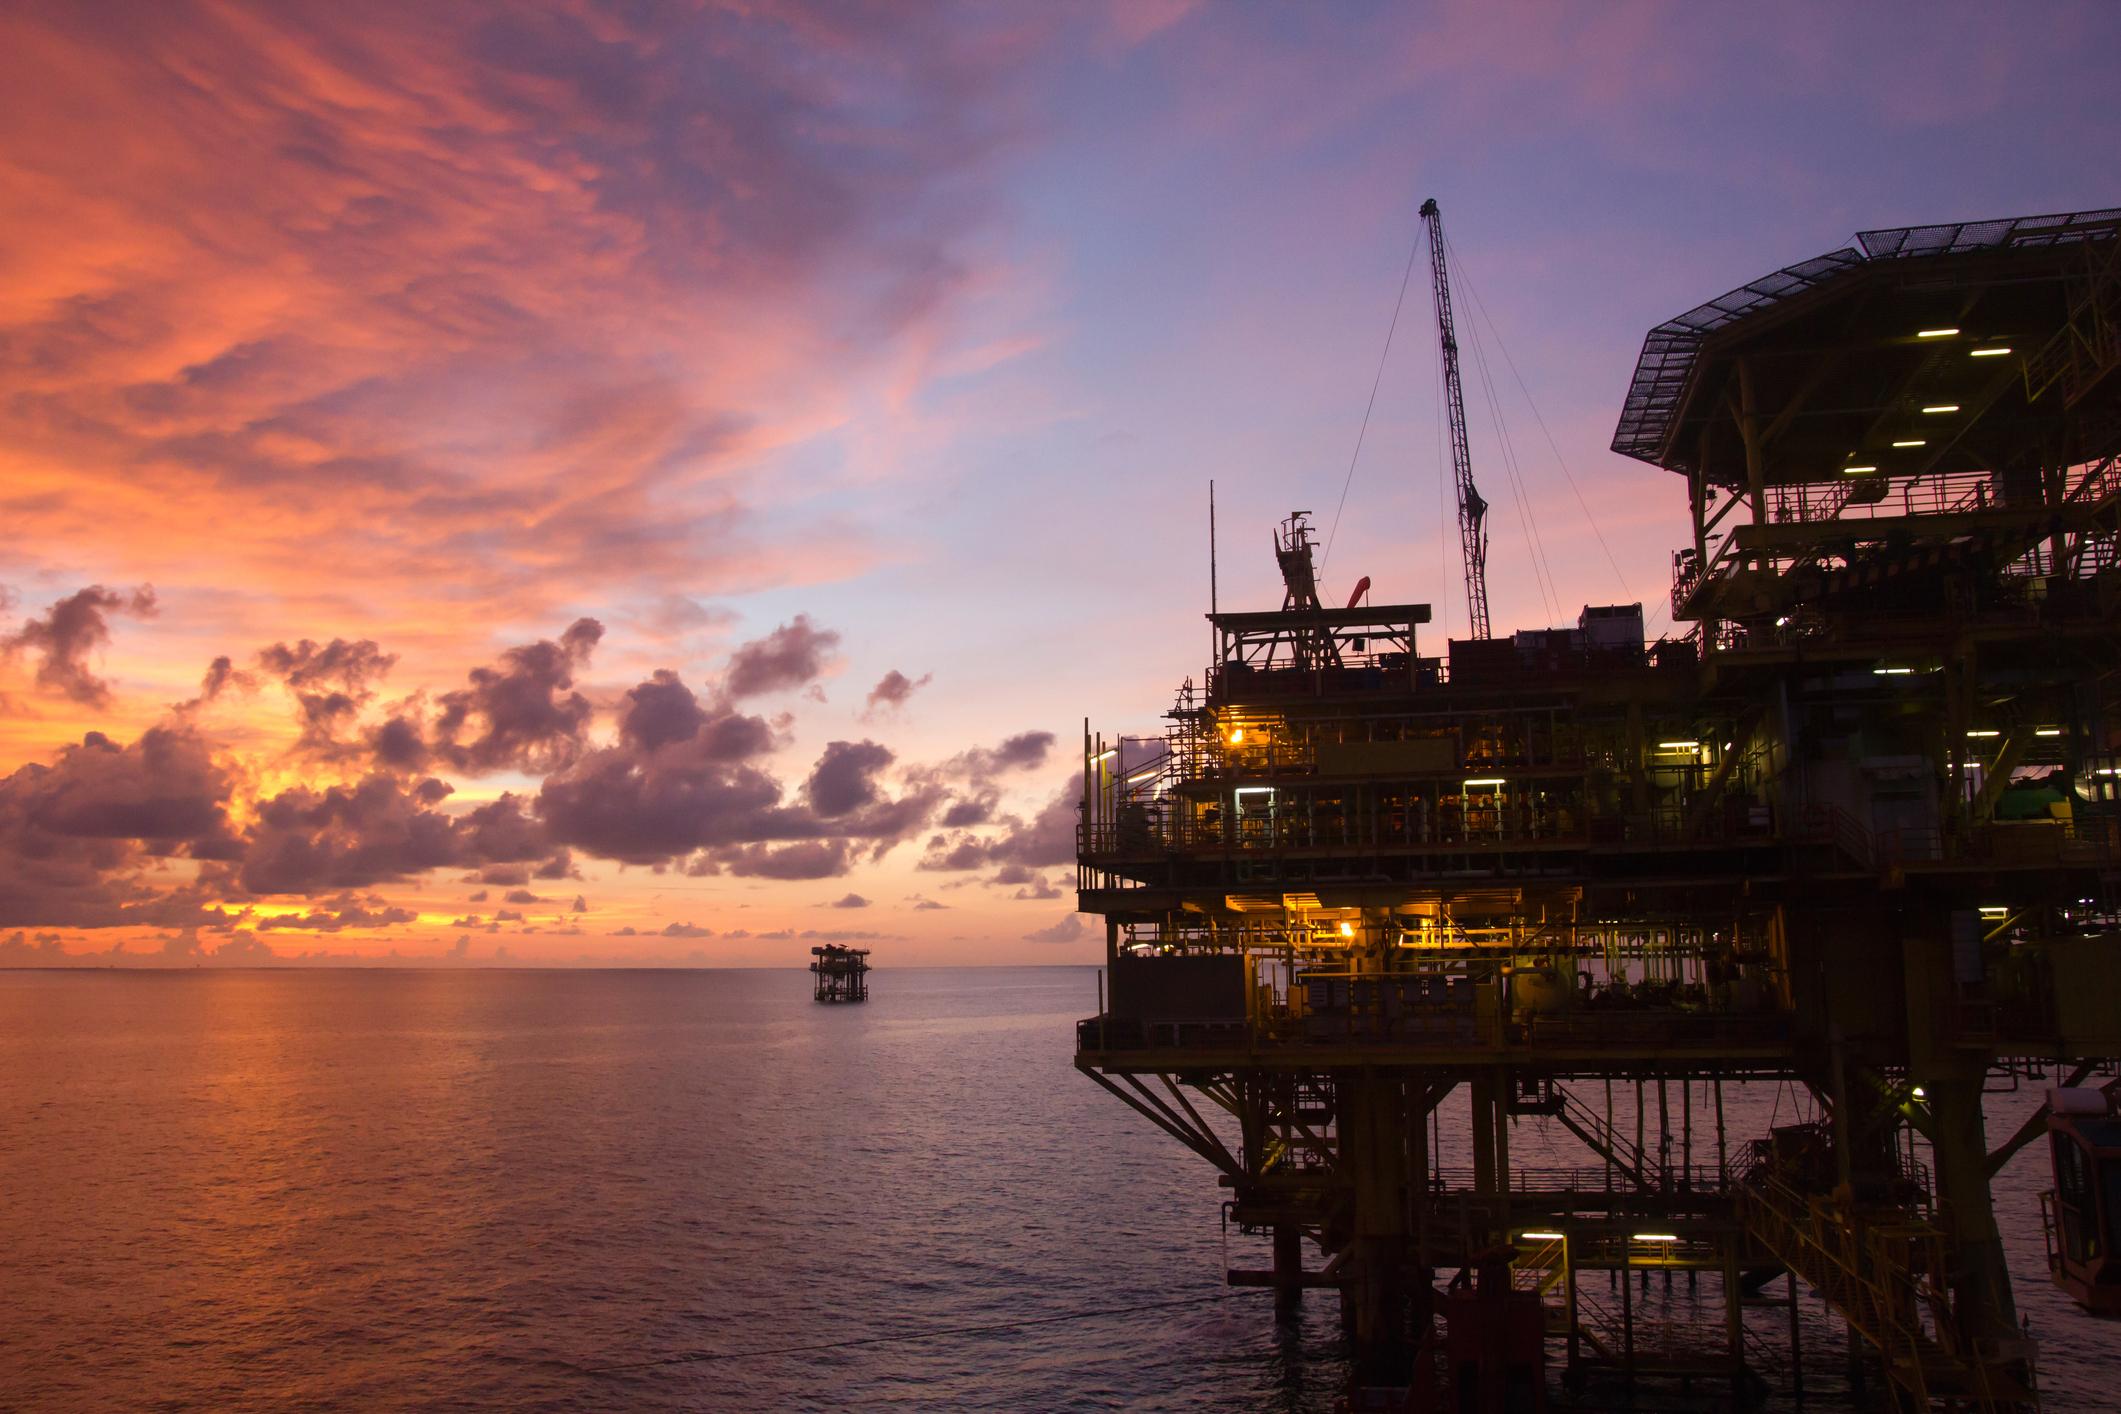 Oil production platform at sunset